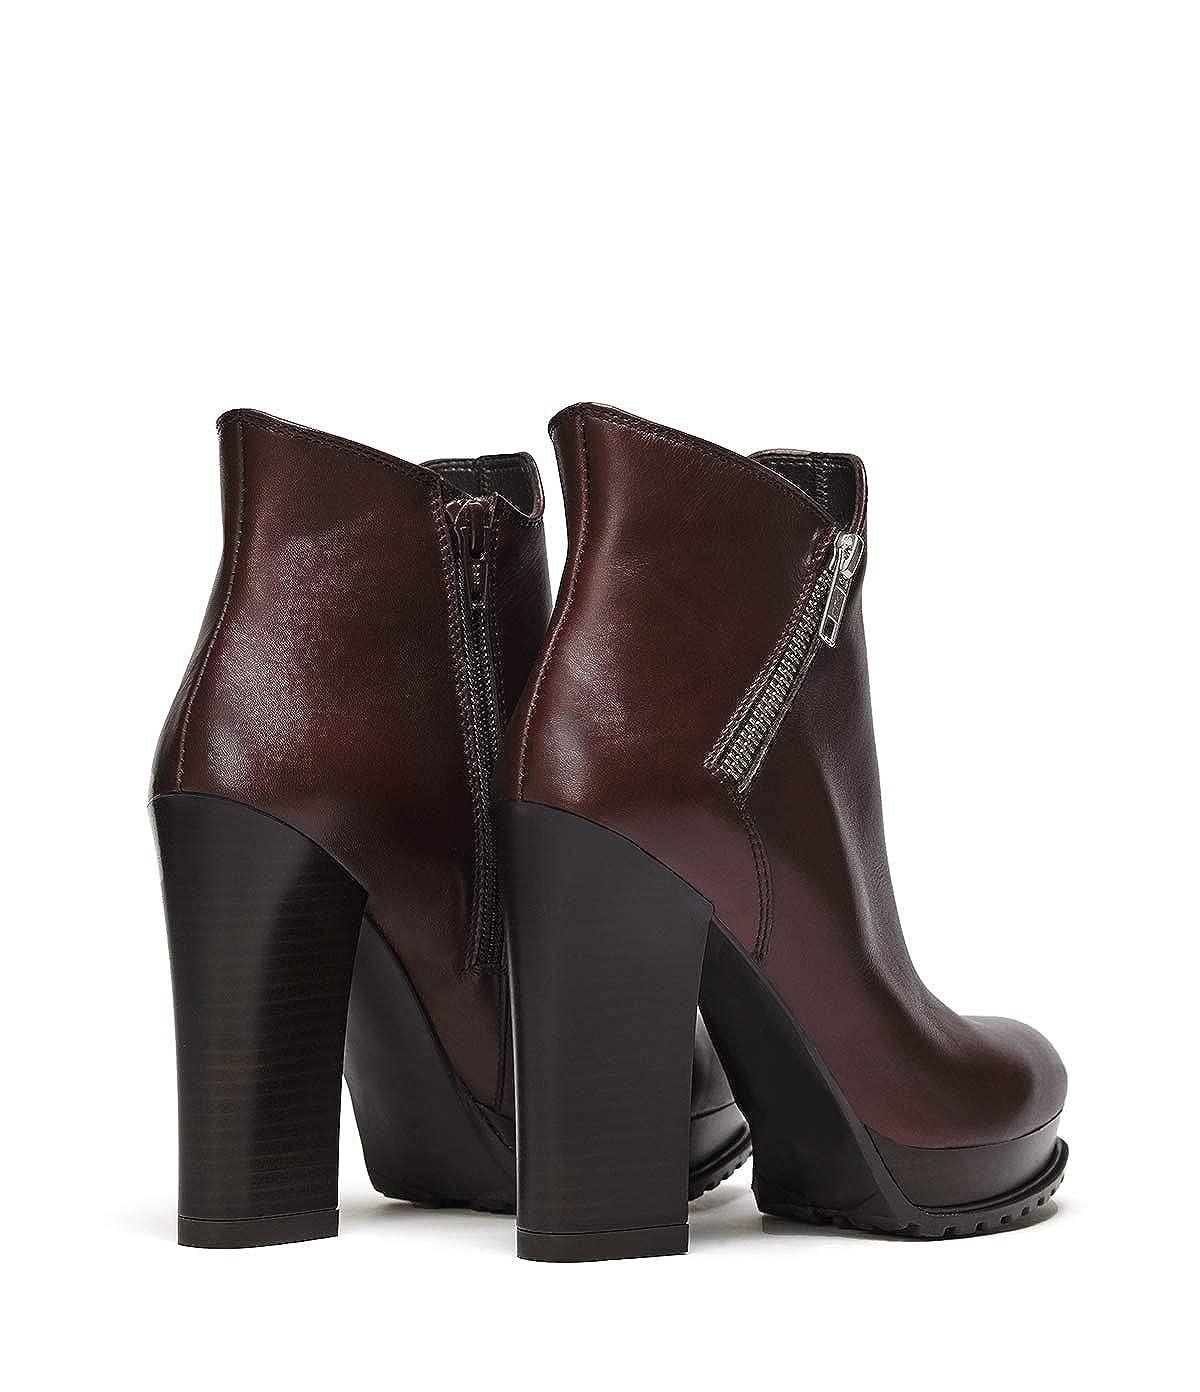 Poi Lei Damen-Schuhe Plateau Stiefelette Emma Bordeaux Stiefeletten Blockabsatz Leder Leder Leder bebd18